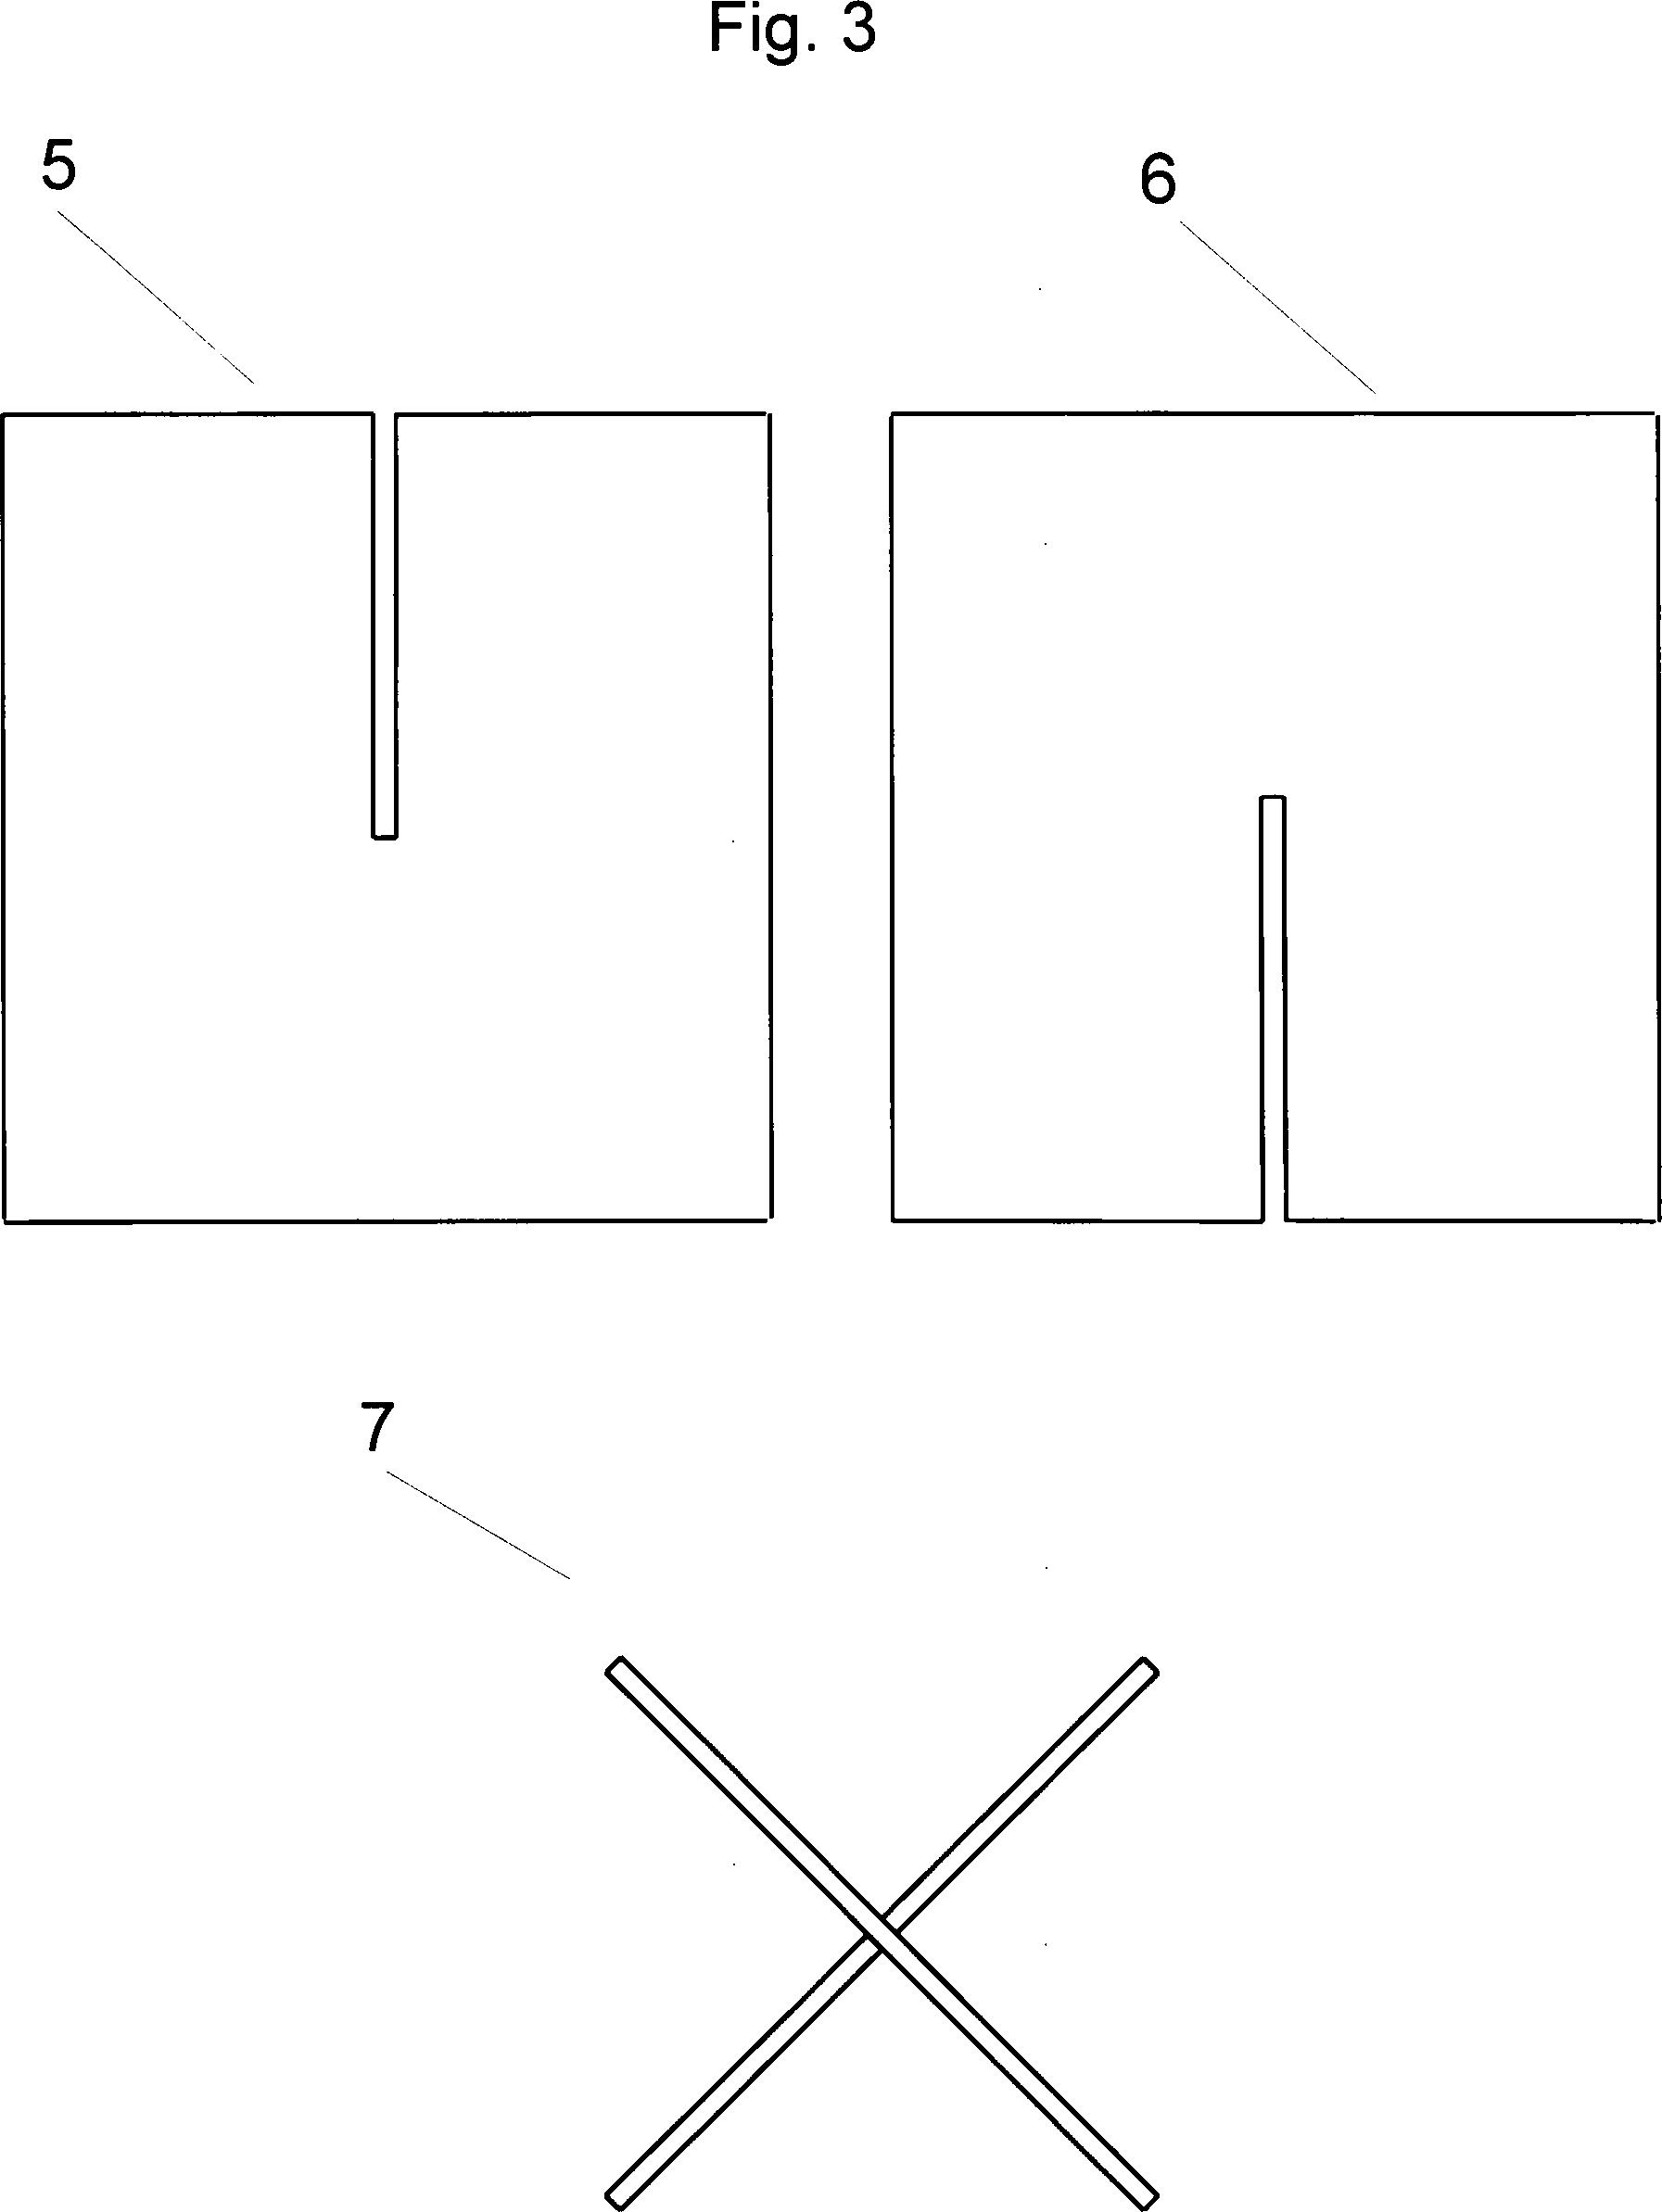 Trittstufe Setzstufe trittstufe setzstufe patent drawing die trittstufe sollte vorne